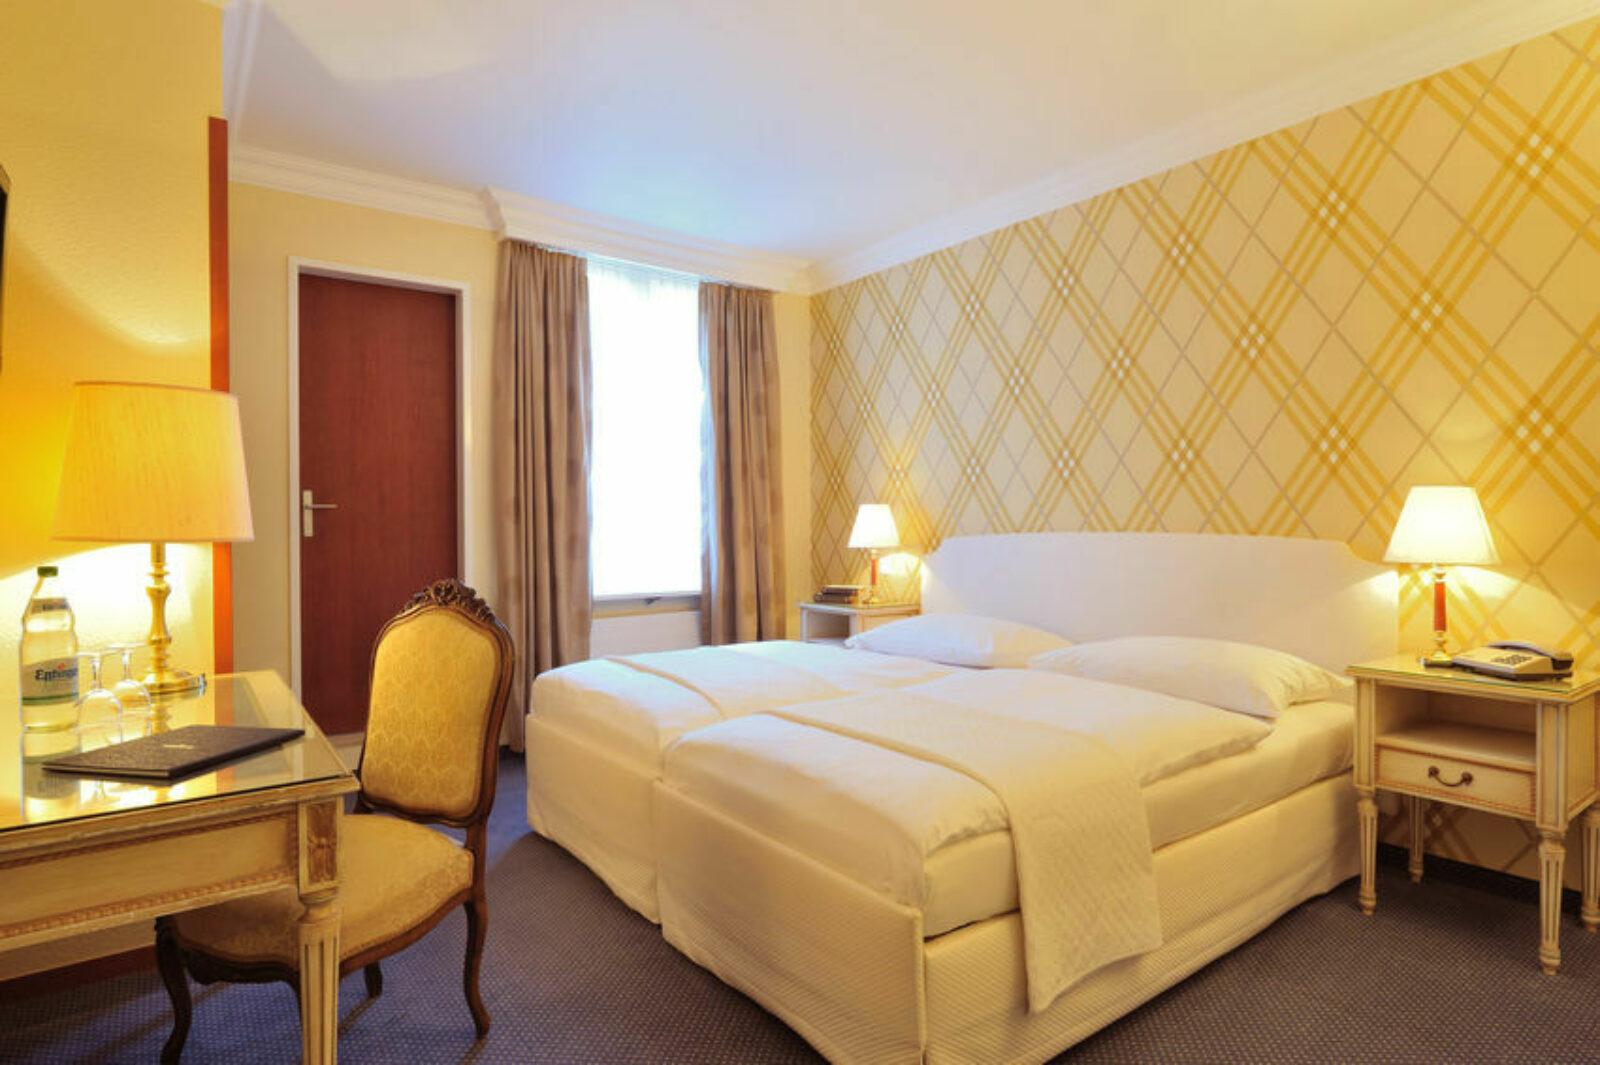 Zimmer Hotel Bad Eptingen